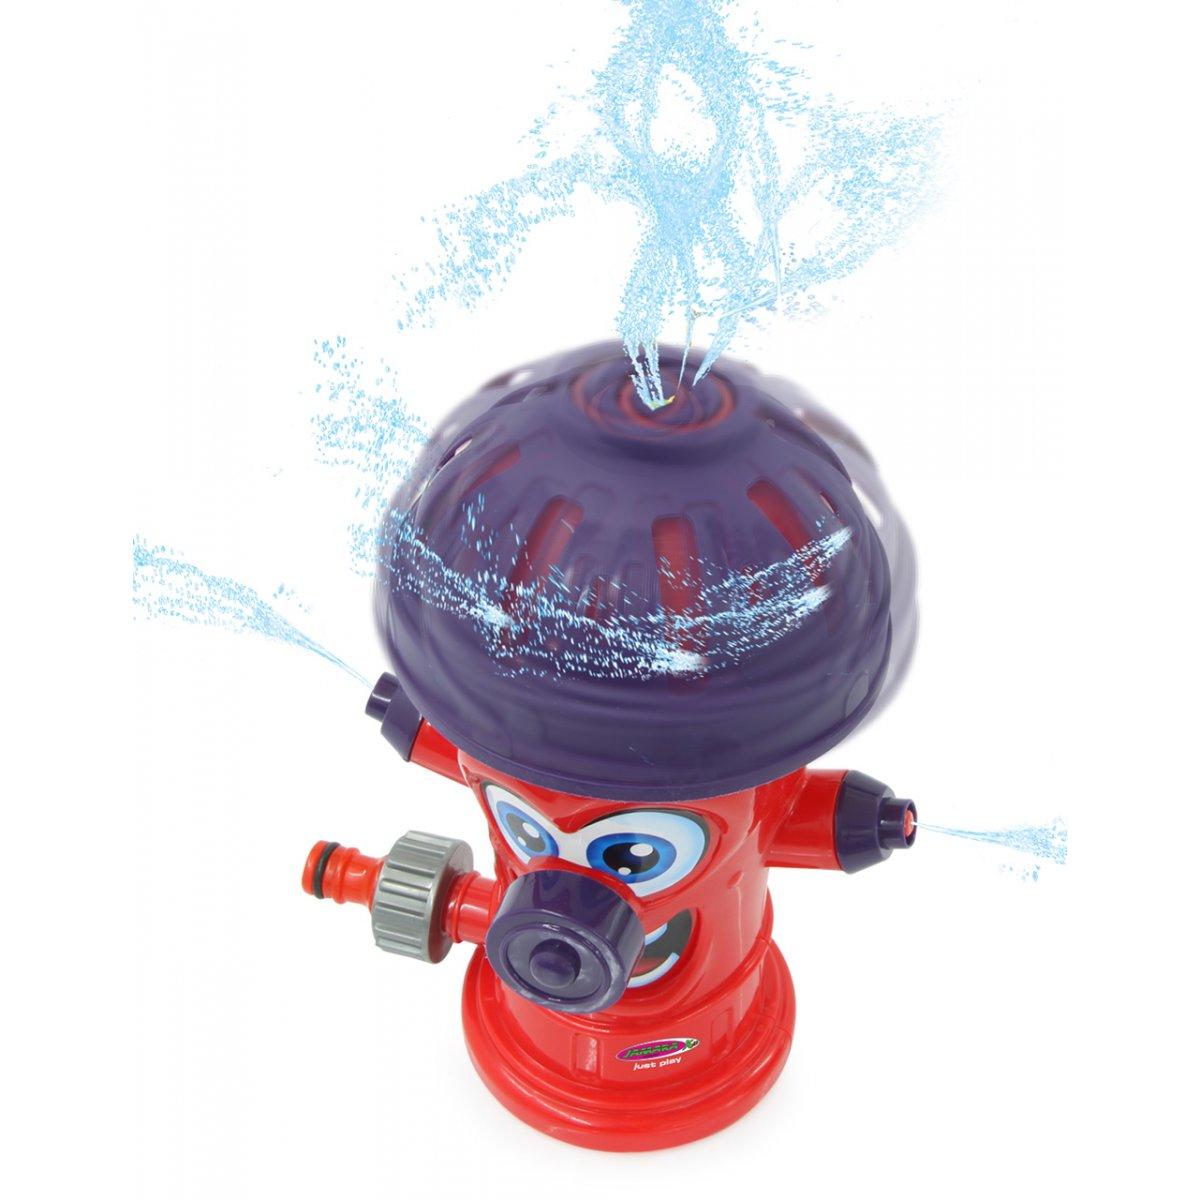 JAMARA Mc Fizz Wasserspielzeug Wassersprinkler Hydrant Happy